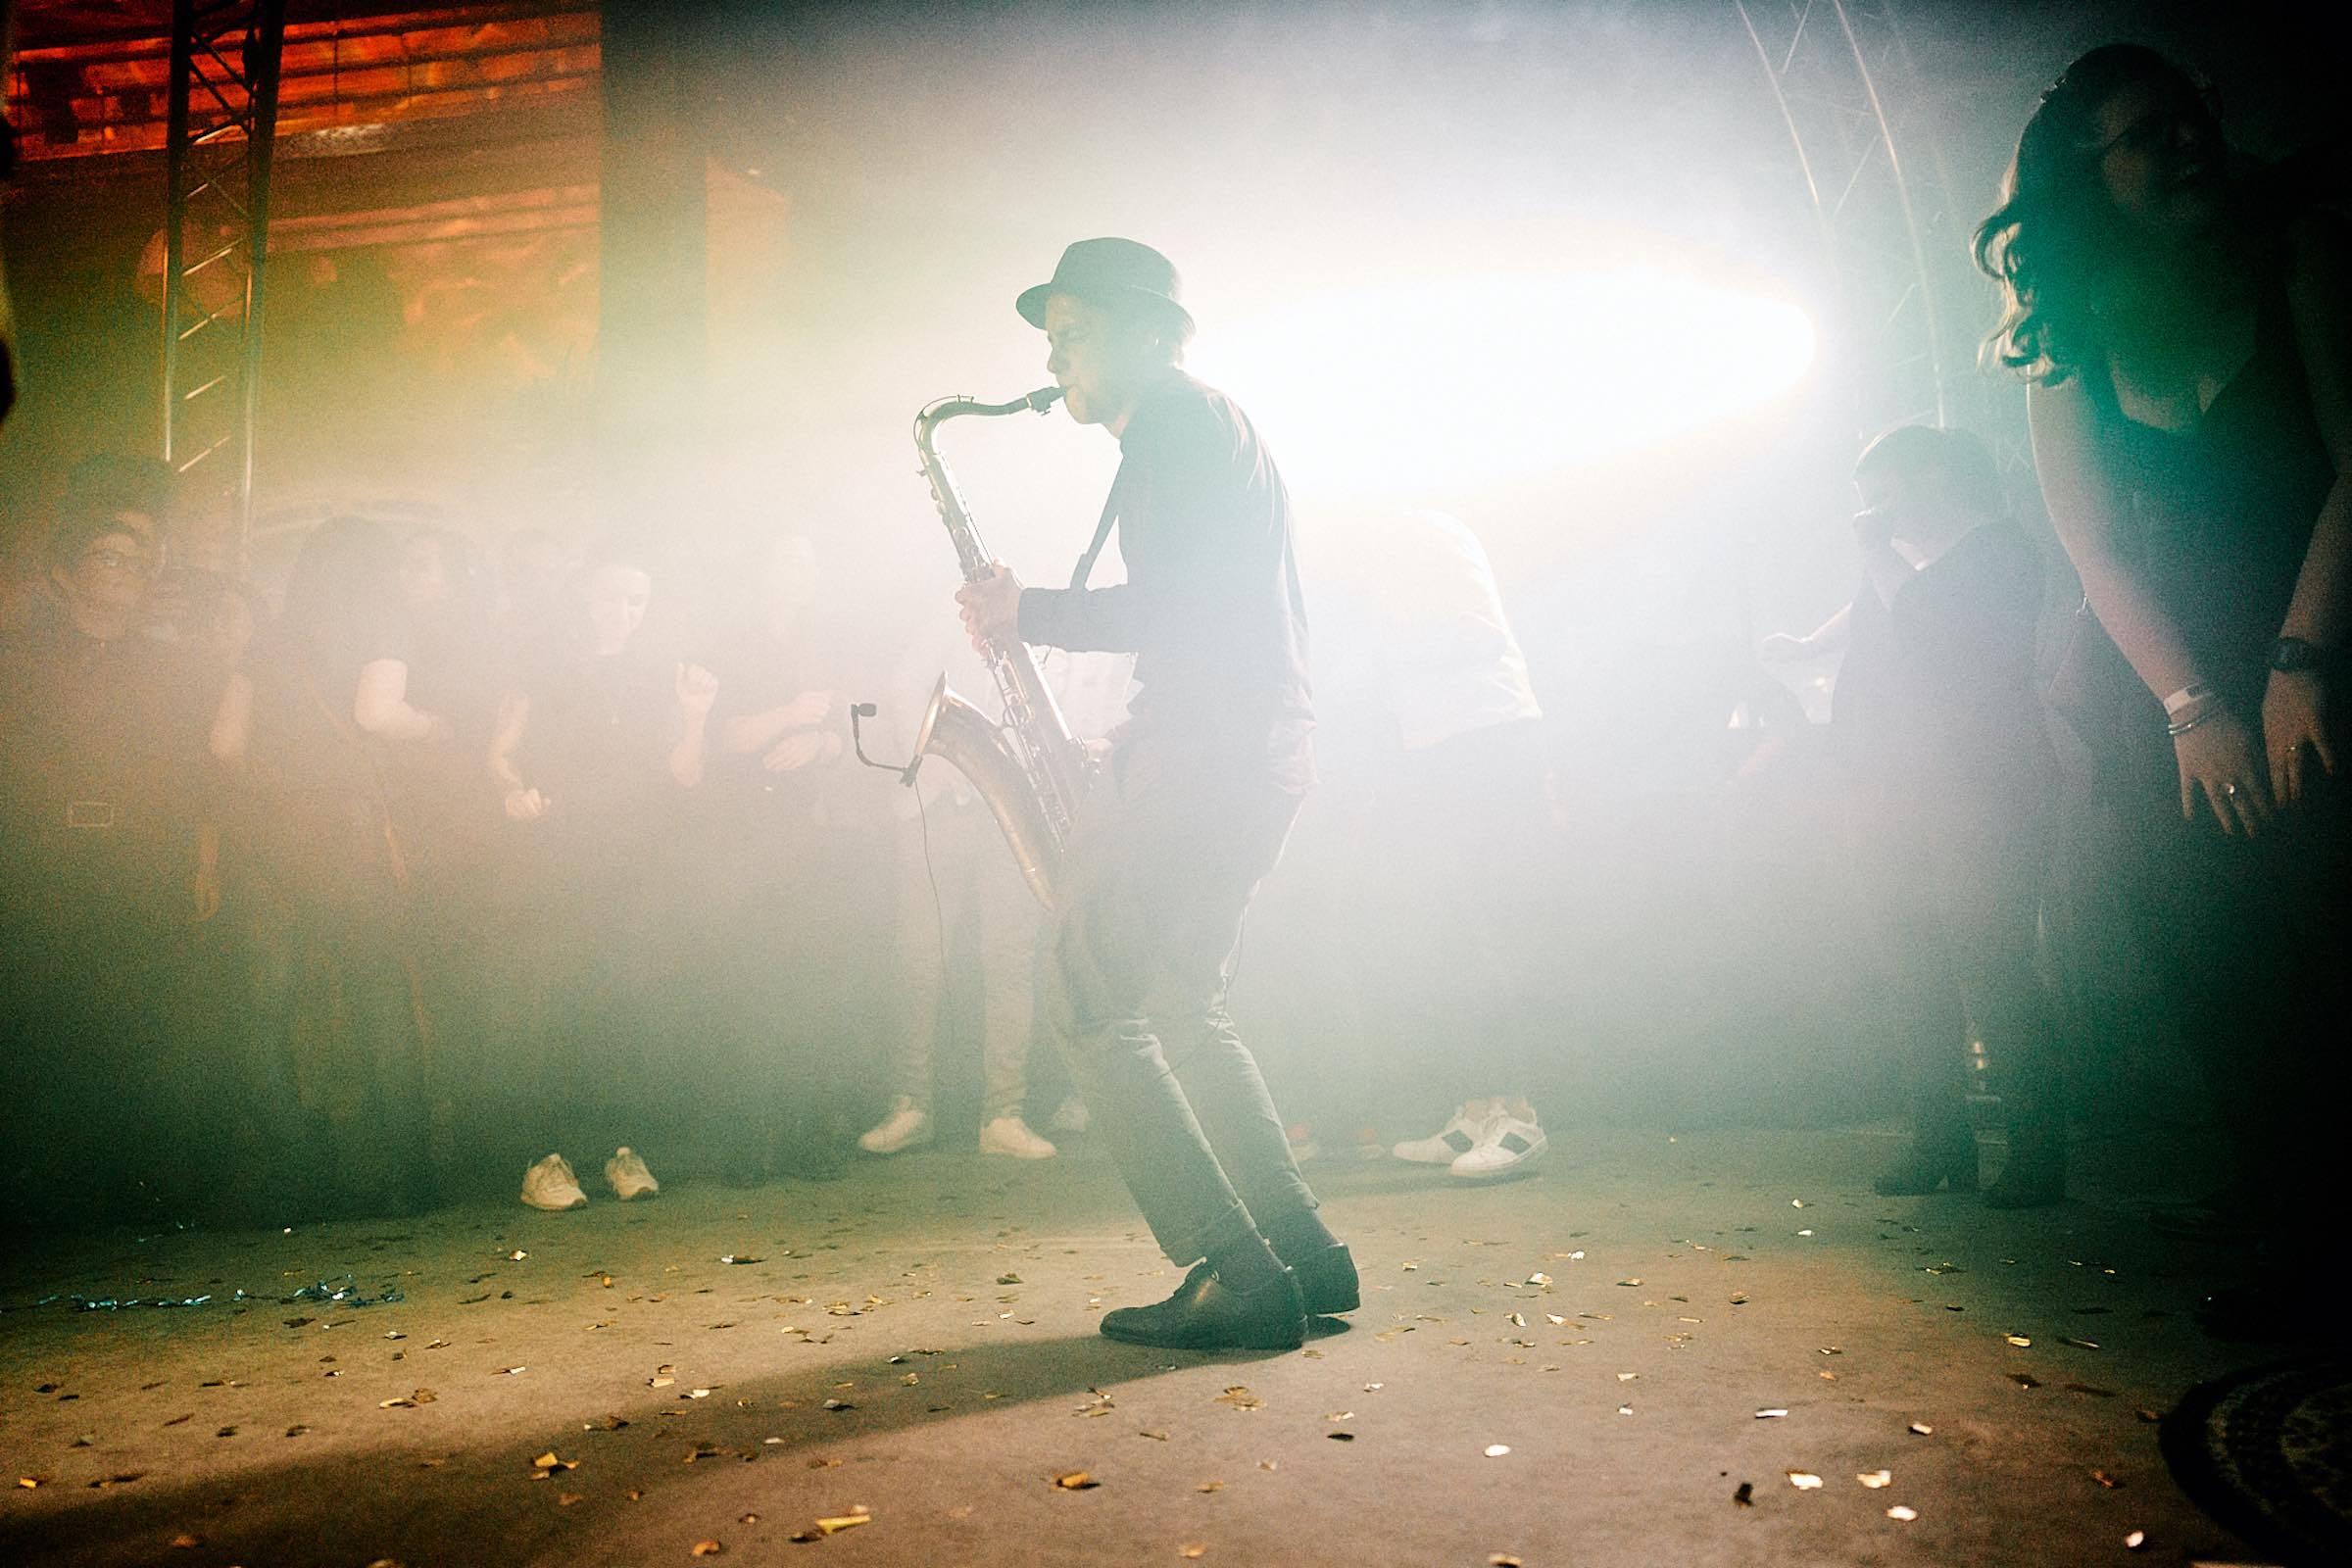 Saxophonist   Saxophon   Hannover   Hochzeit   Buchen   Livemusik   Buchen   House   Electro   Swing   Pop   Party   DJ   Sektempfang   Trauung   Empfang   Messe   Firmenfeier   Mieten   Anfragen   Lehmann   Eventservice